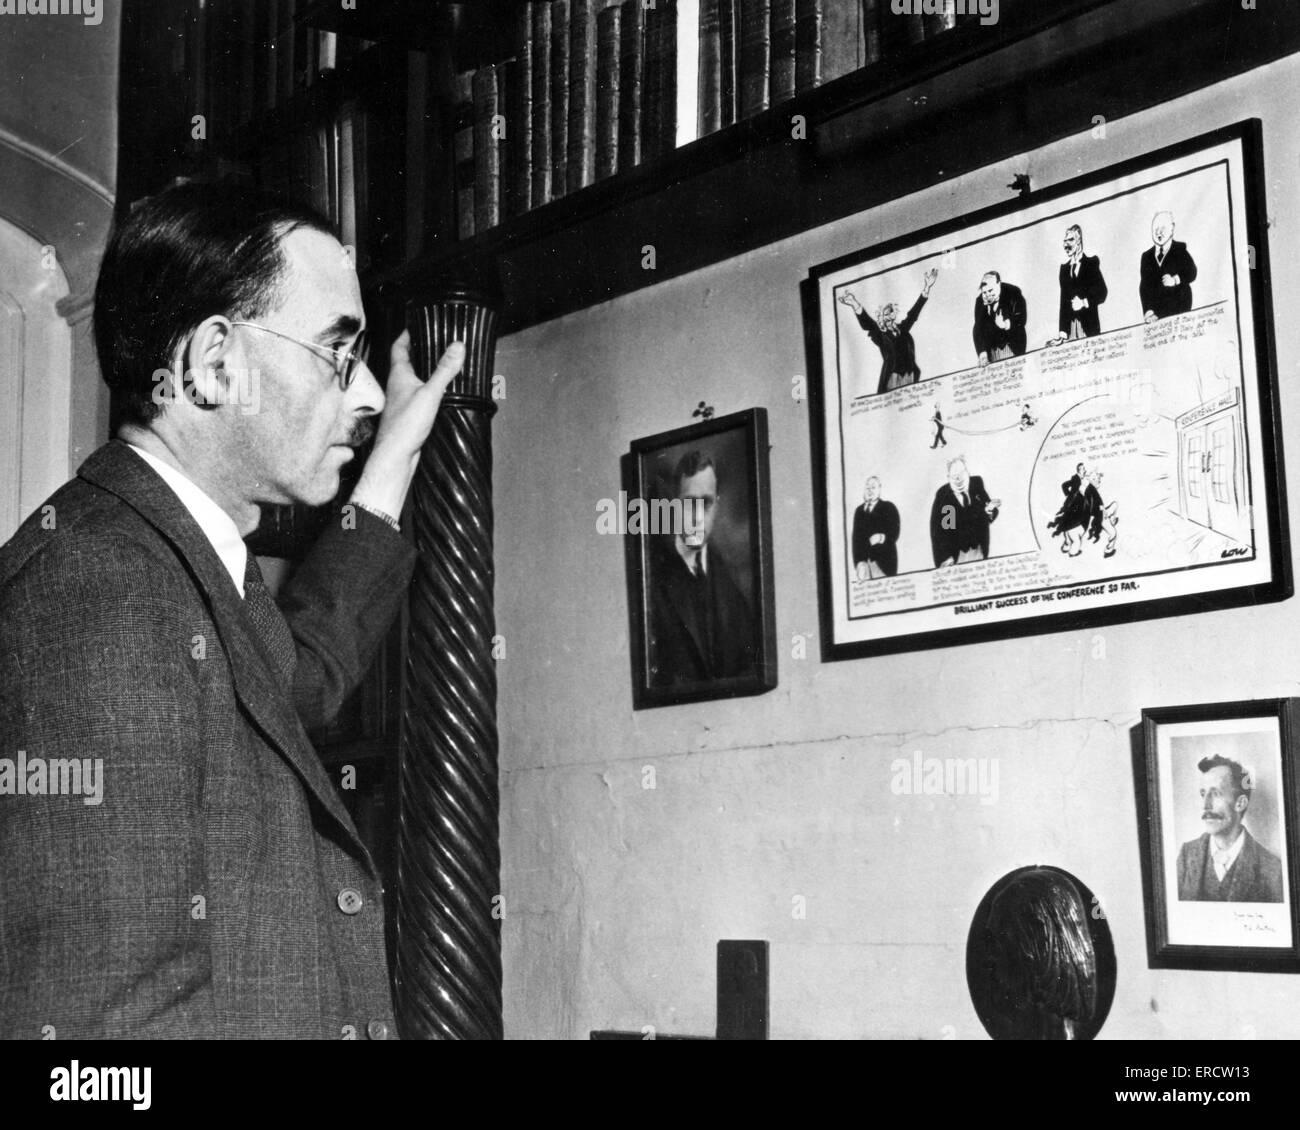 HAROLD LASKI (1893-1950) English political theorist about 1940 - Stock Image